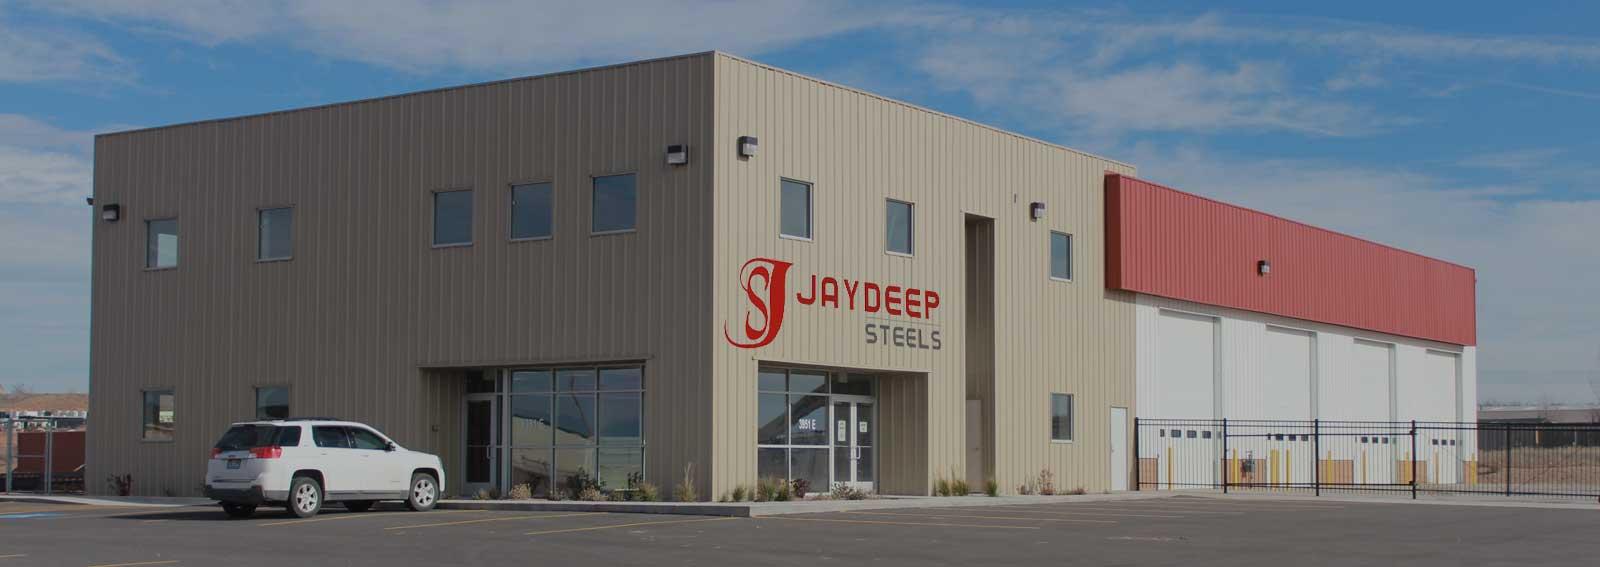 Jaydeep Steels